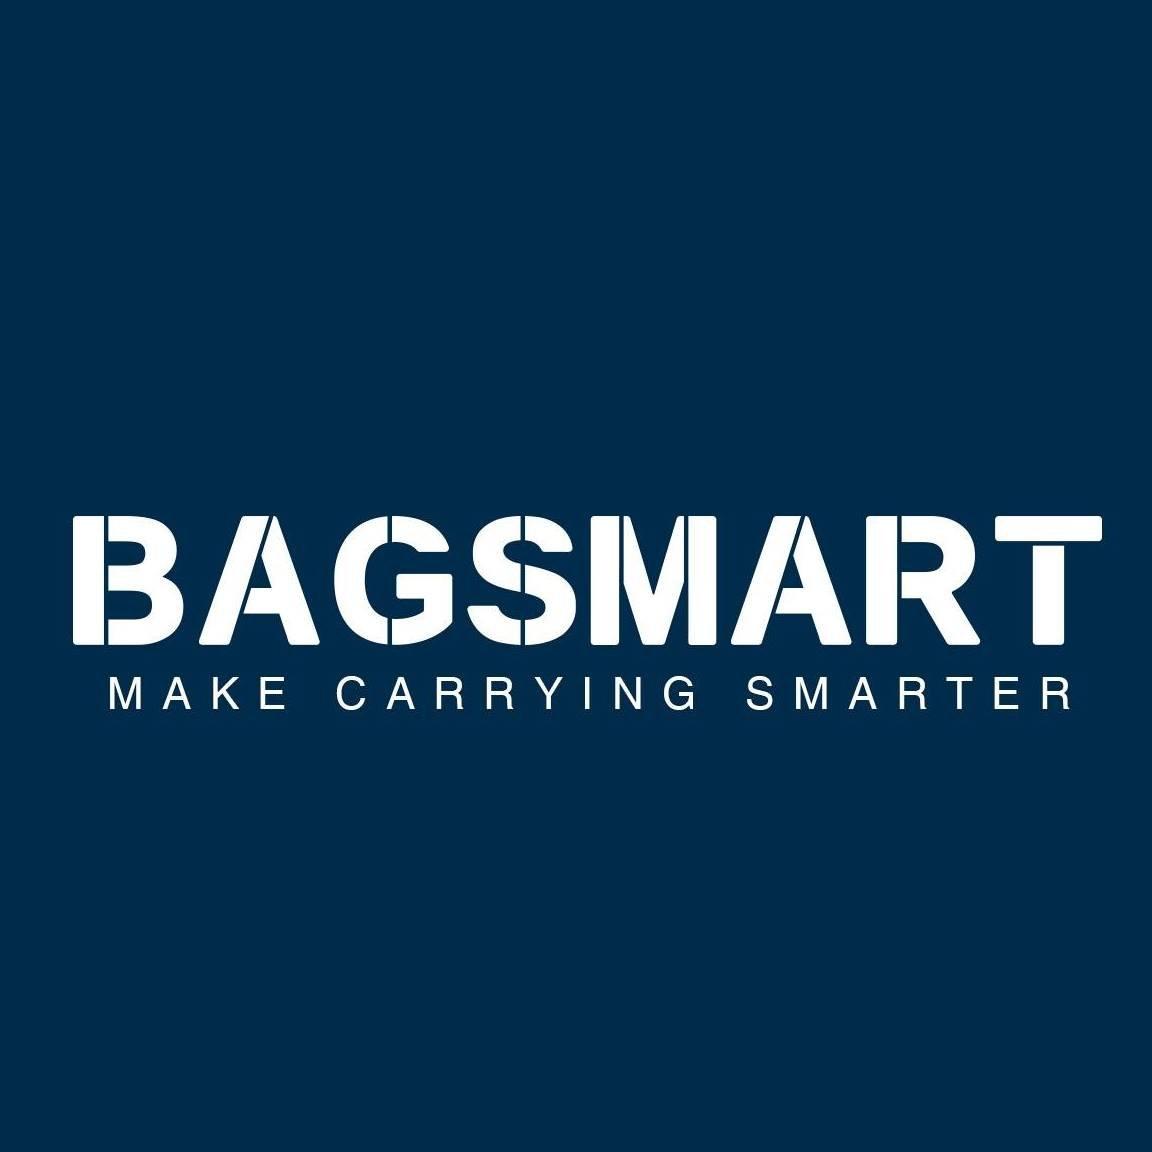 Bagsmart.com